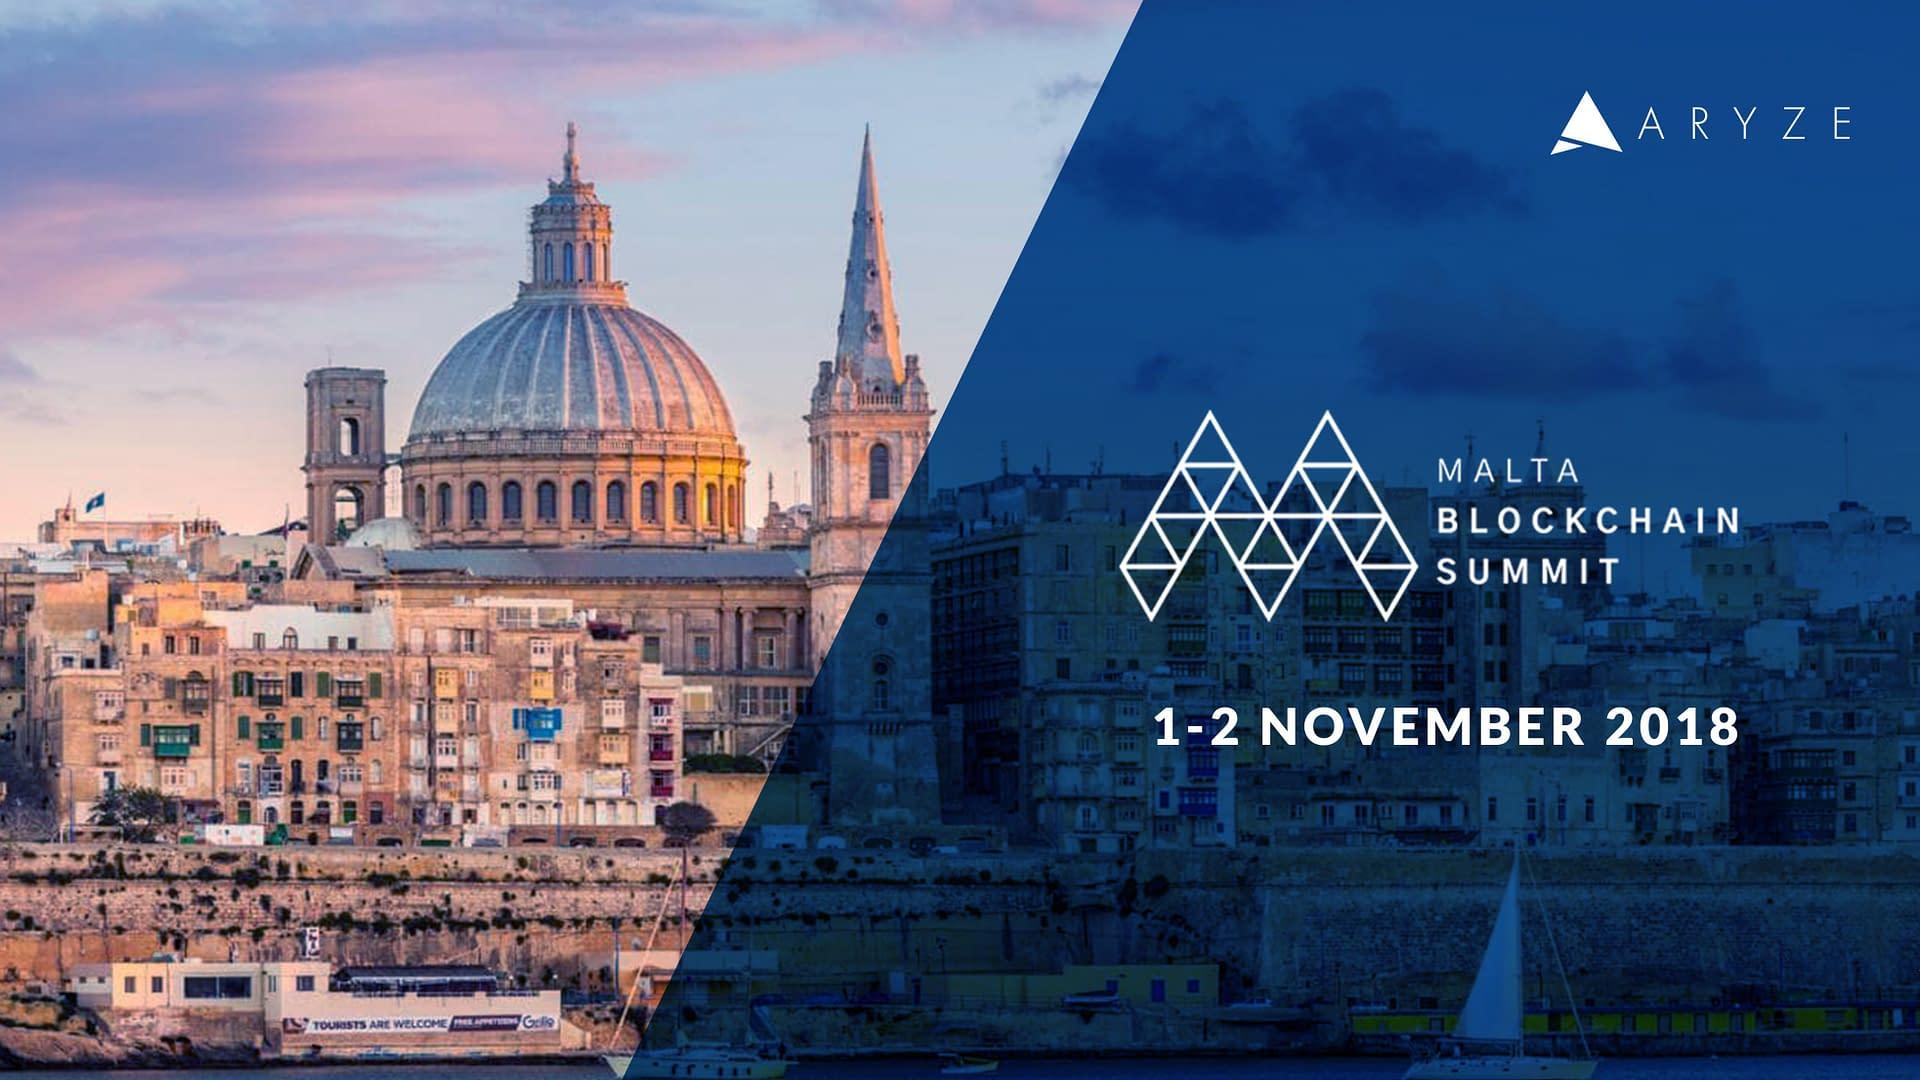 ARYZE to take part of Malta Blockchain Summit